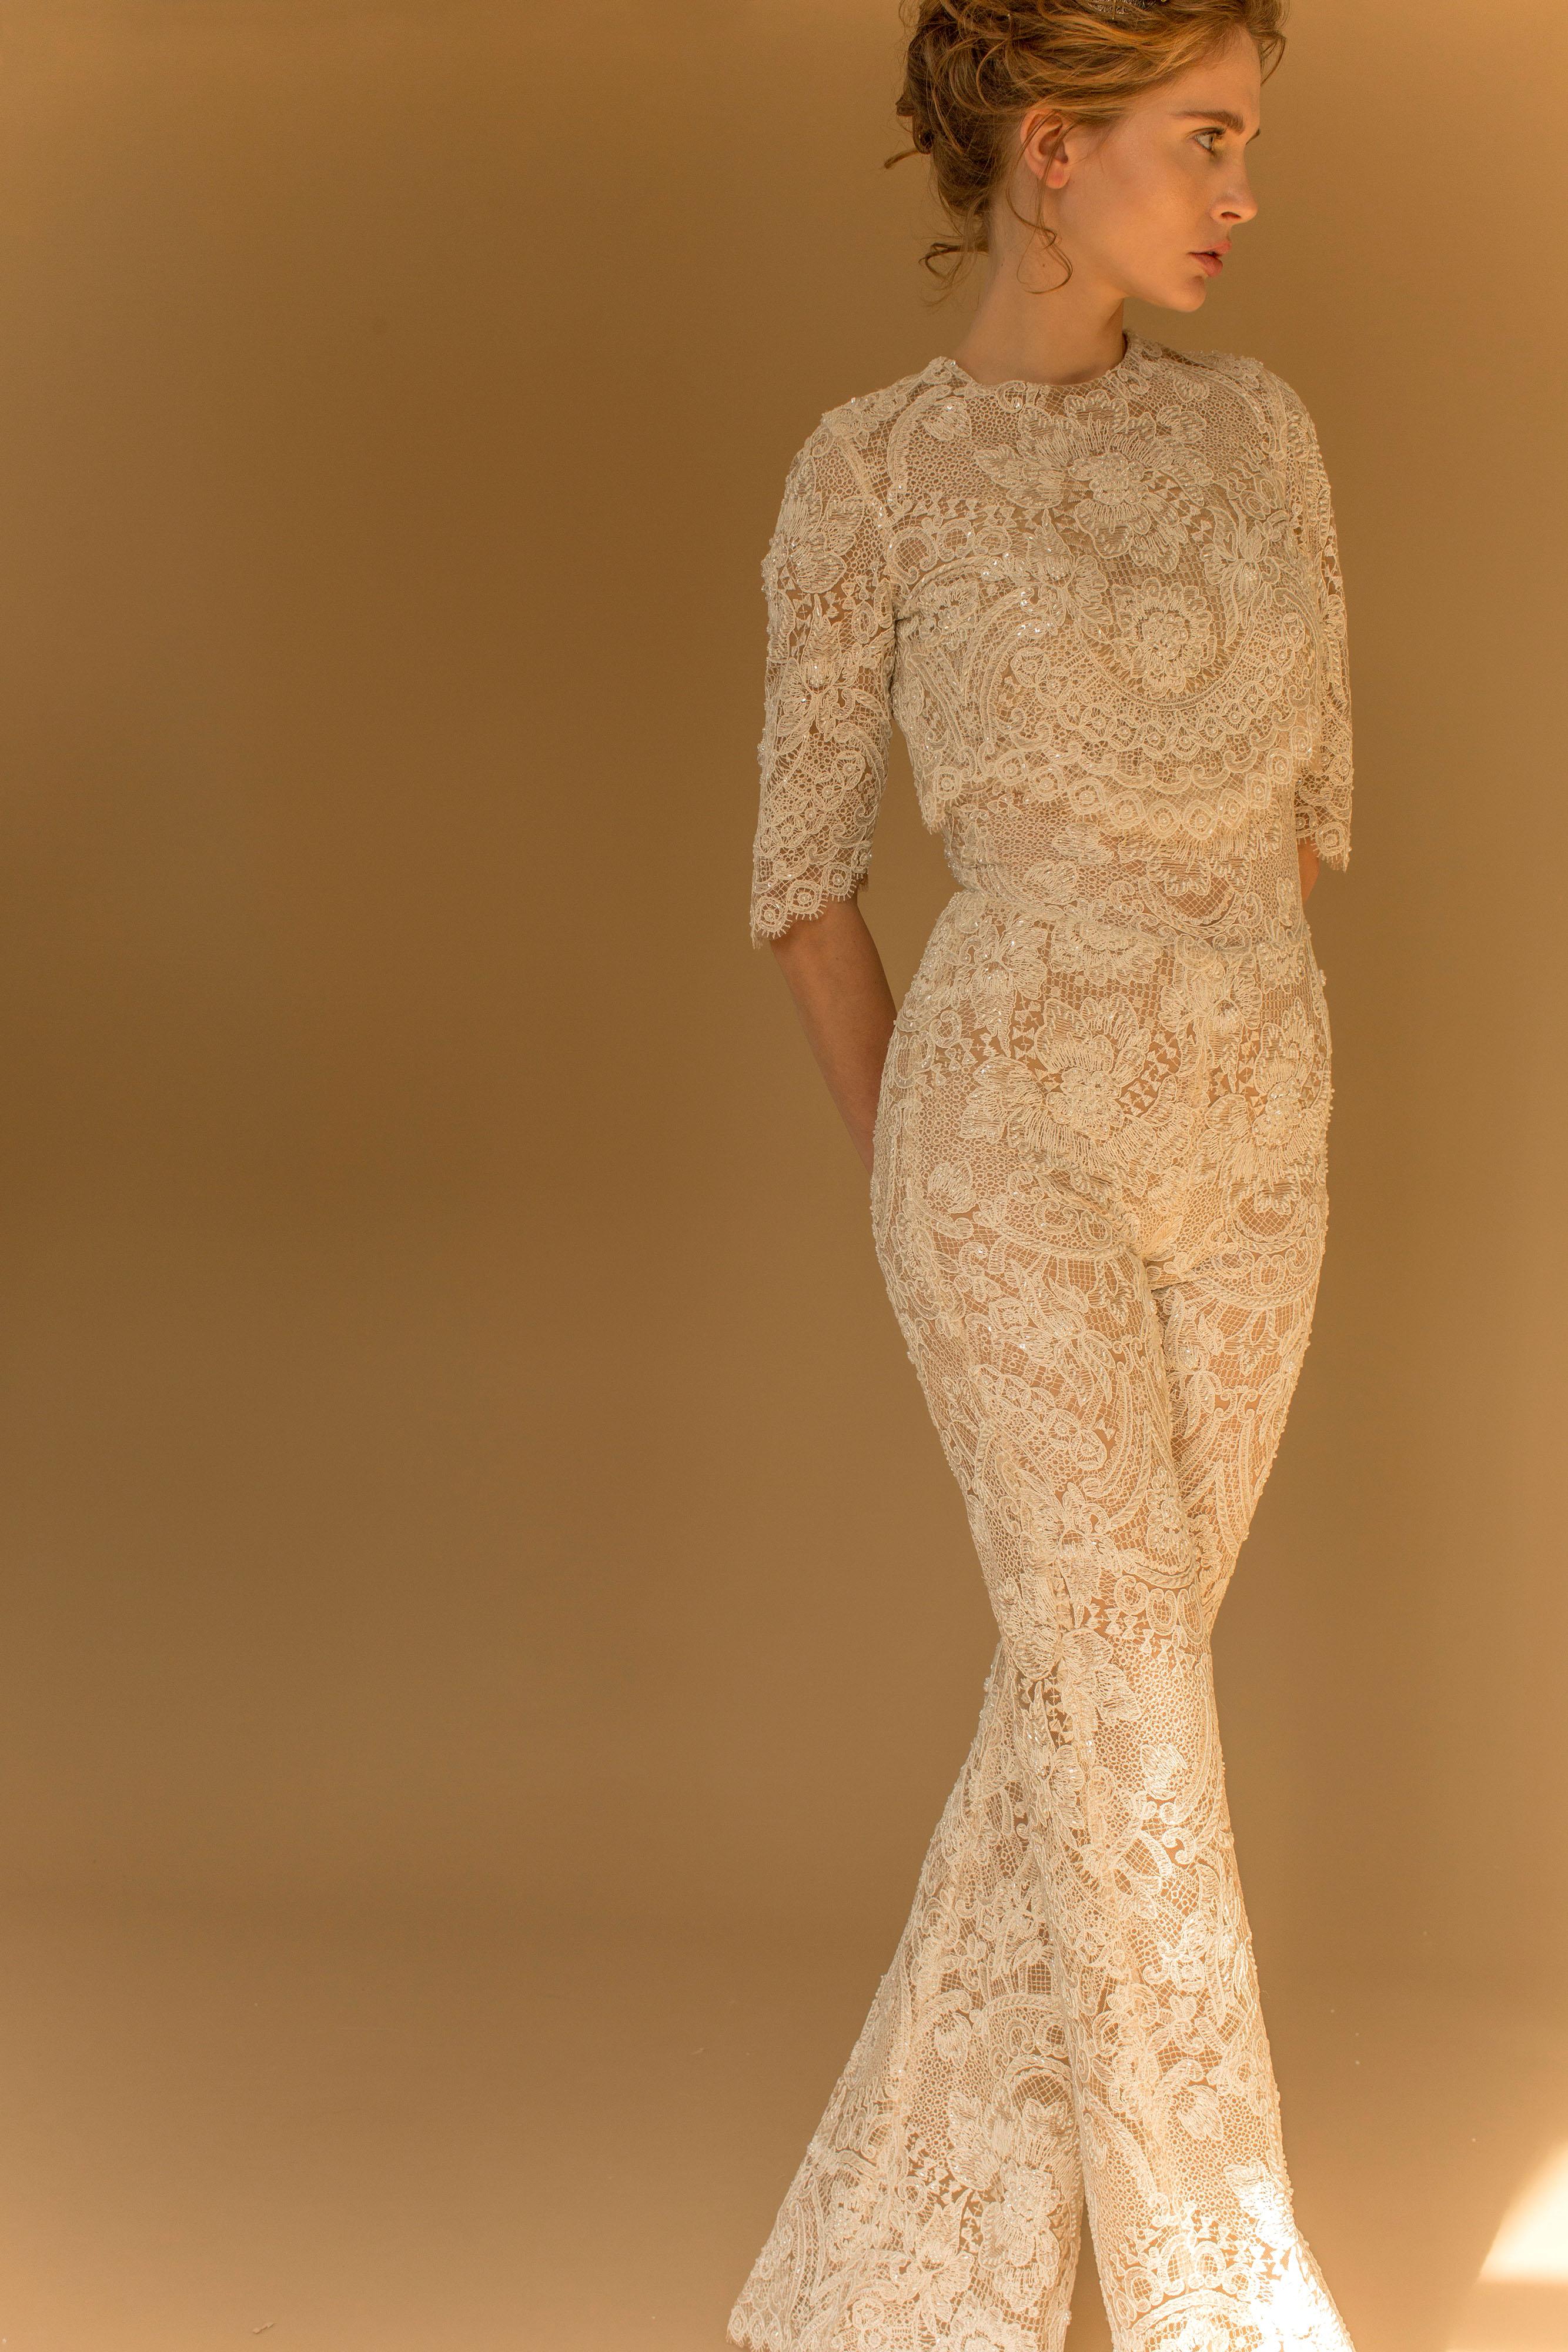 francesca miranda wedding dress fall 2018 jumpsuit lace three-quarter length sleeves